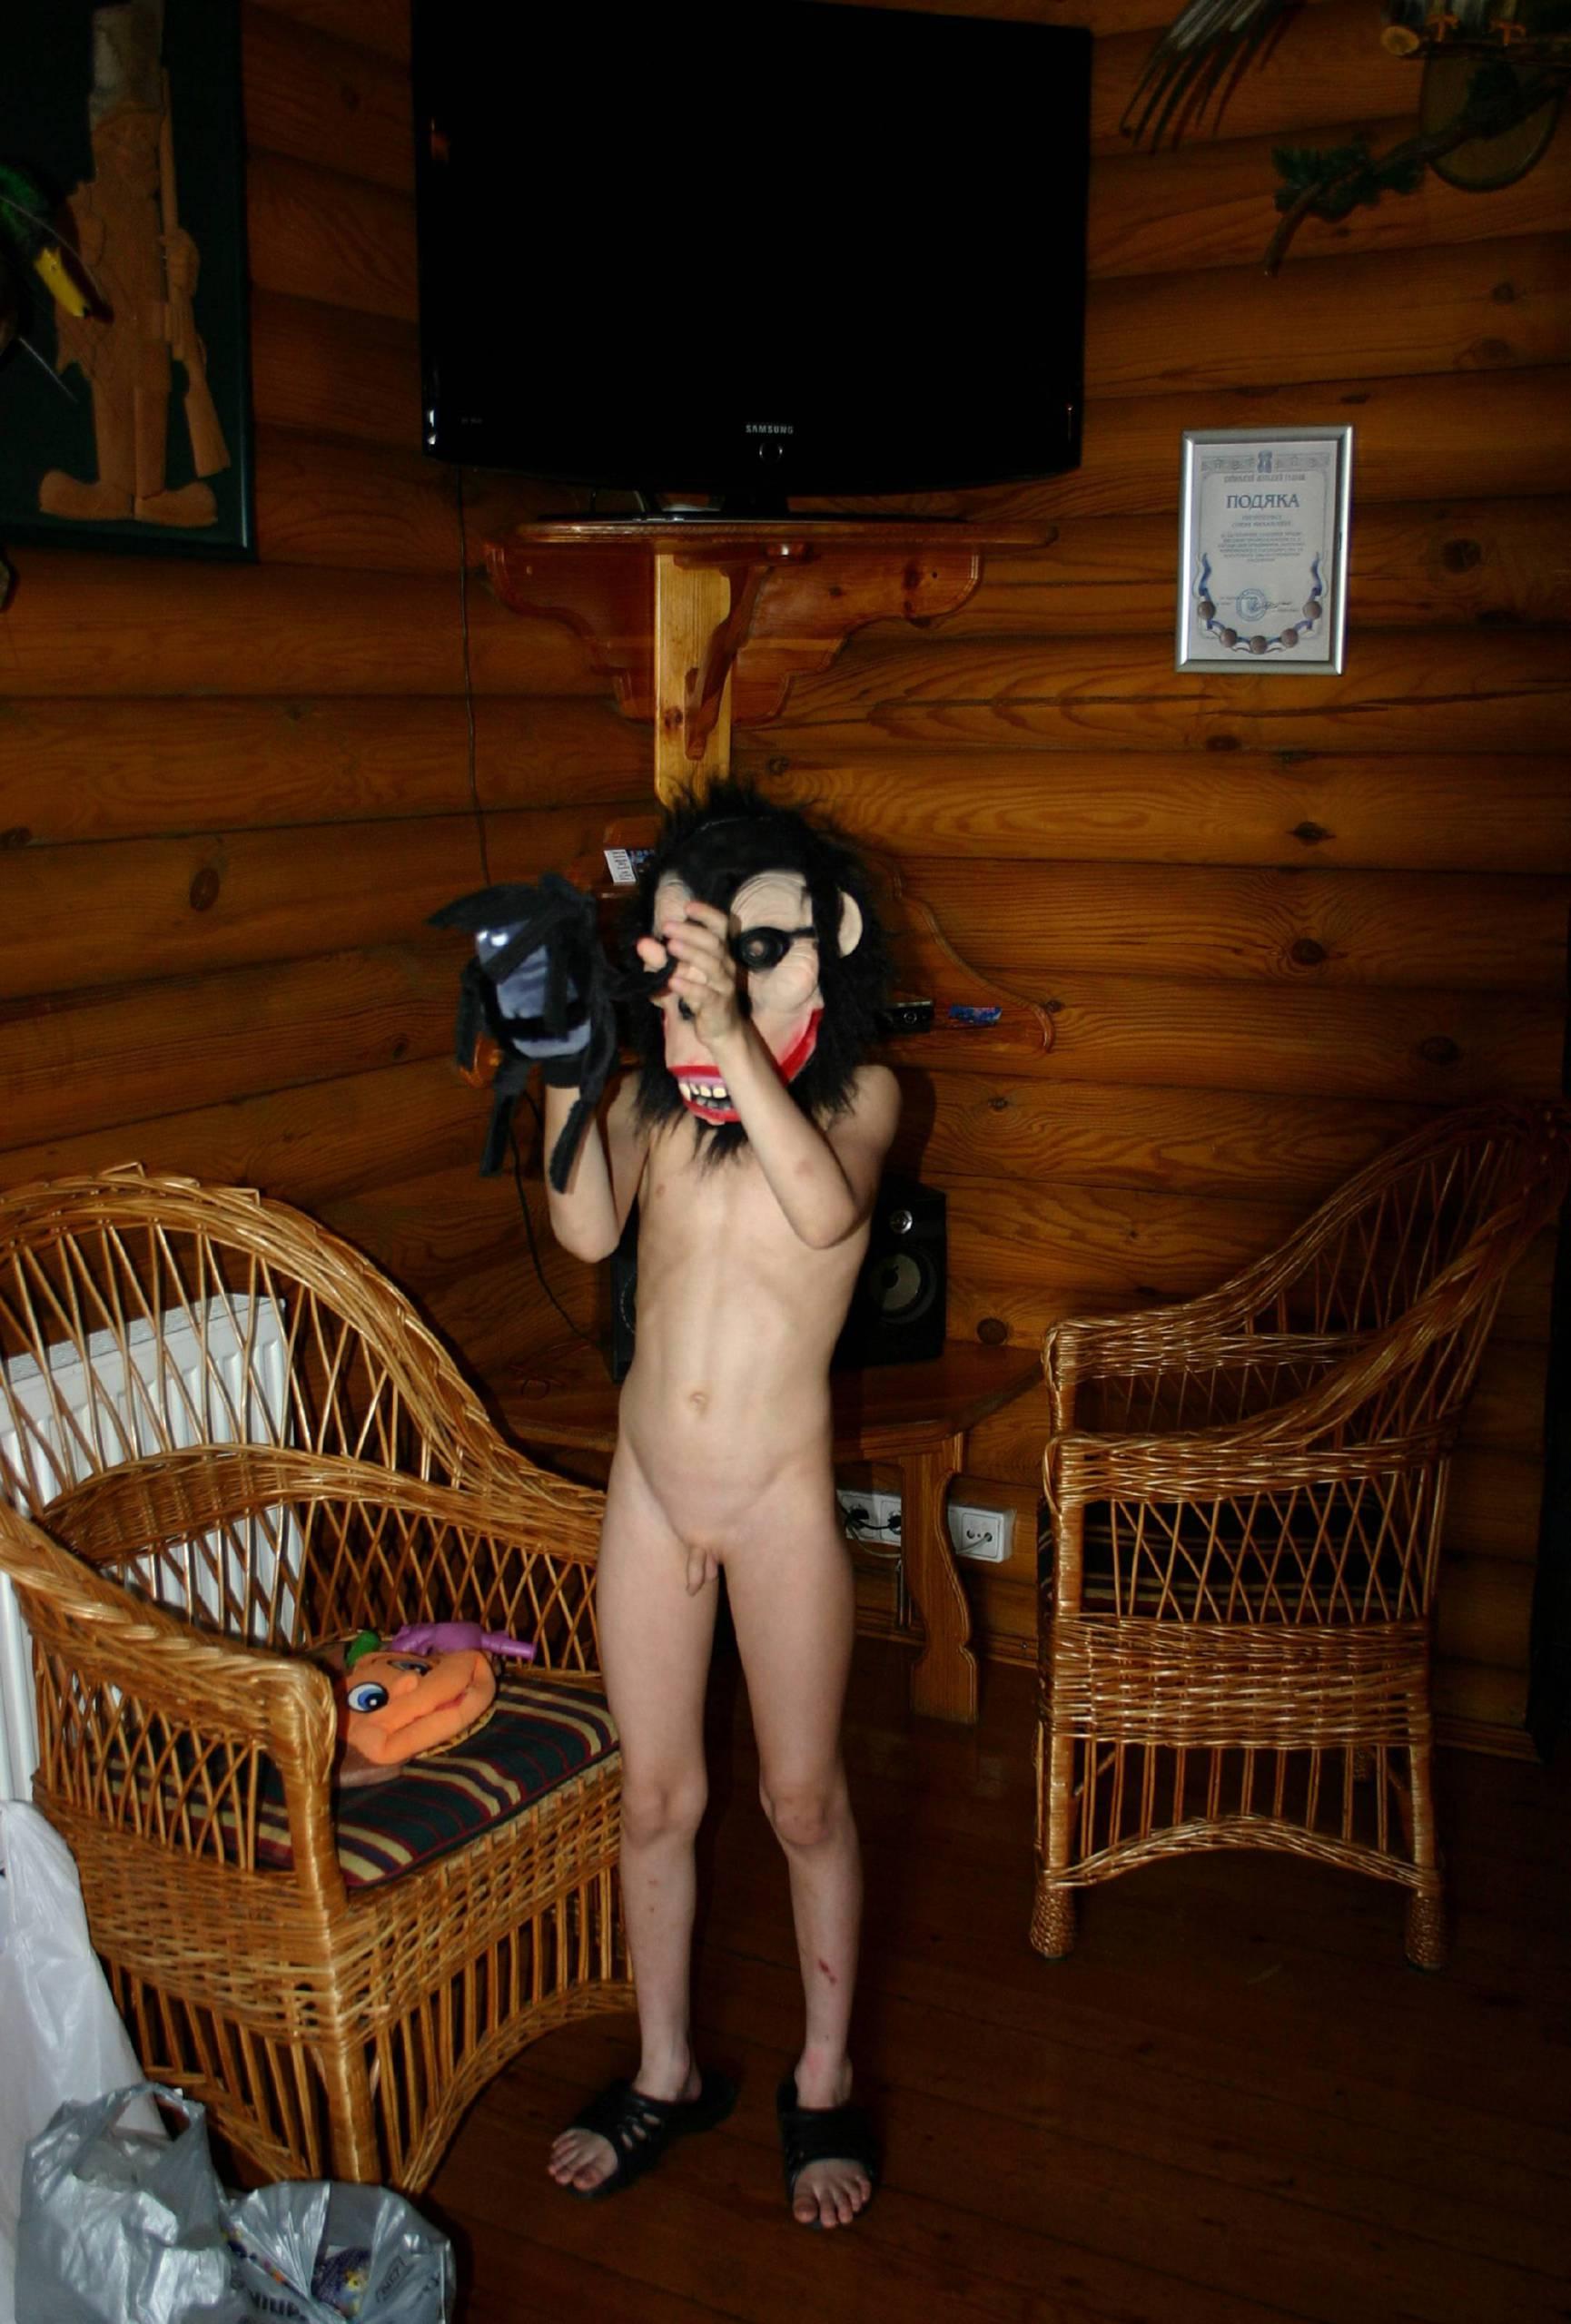 Nudist Pics Nude Girl Birthday Party - 1